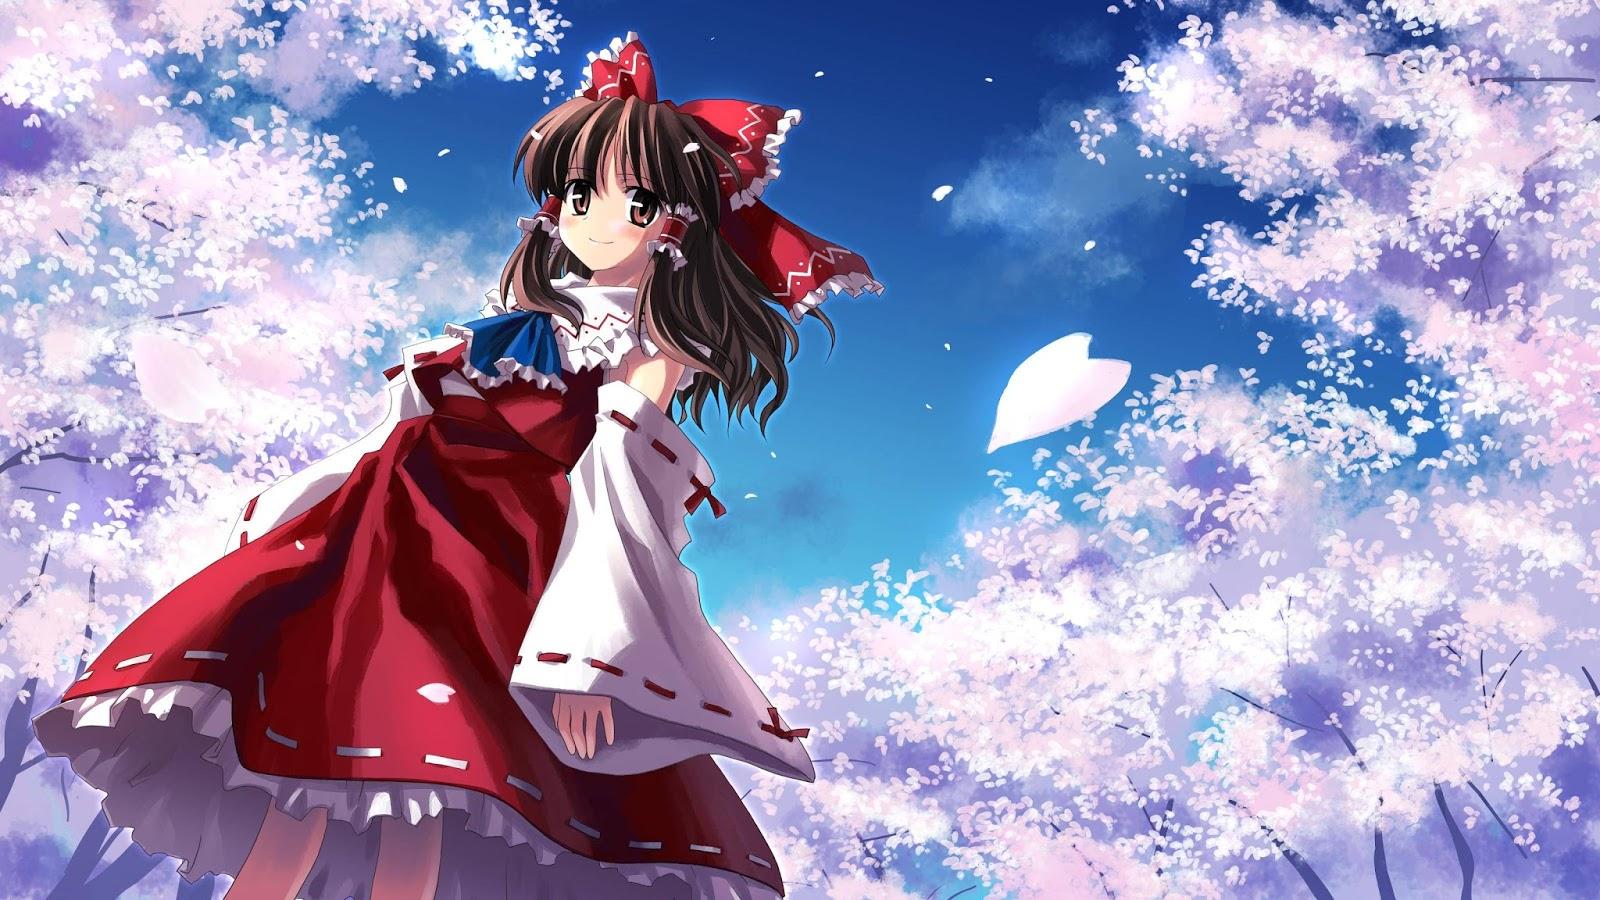 Mecha Anime Girl Wallpapers